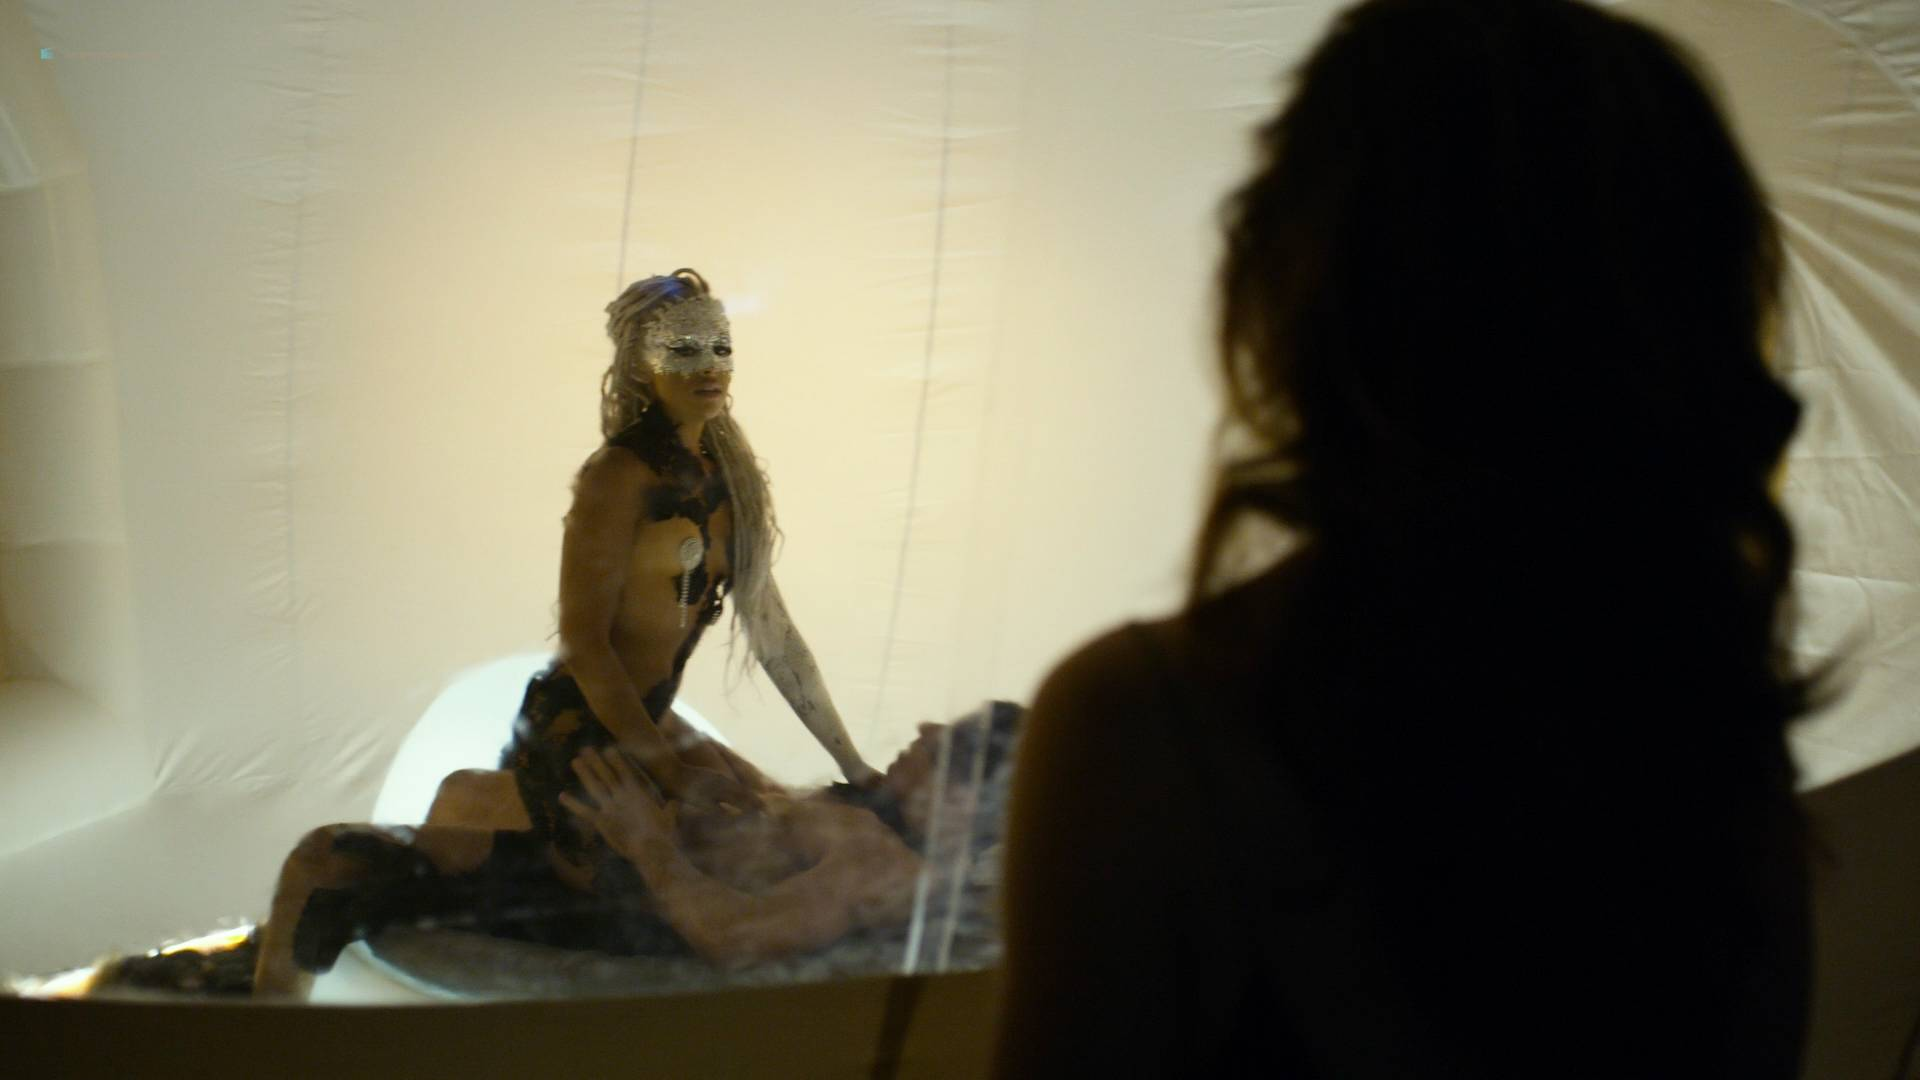 Essie-Davis-topless-Anna-Paquin-Rachelle-Lefevre-Juno-Temple-hot-and-sexy-P.K.D-Electric-Dreams-2017-s1e5-6-8-HD-1080p-008.jpg